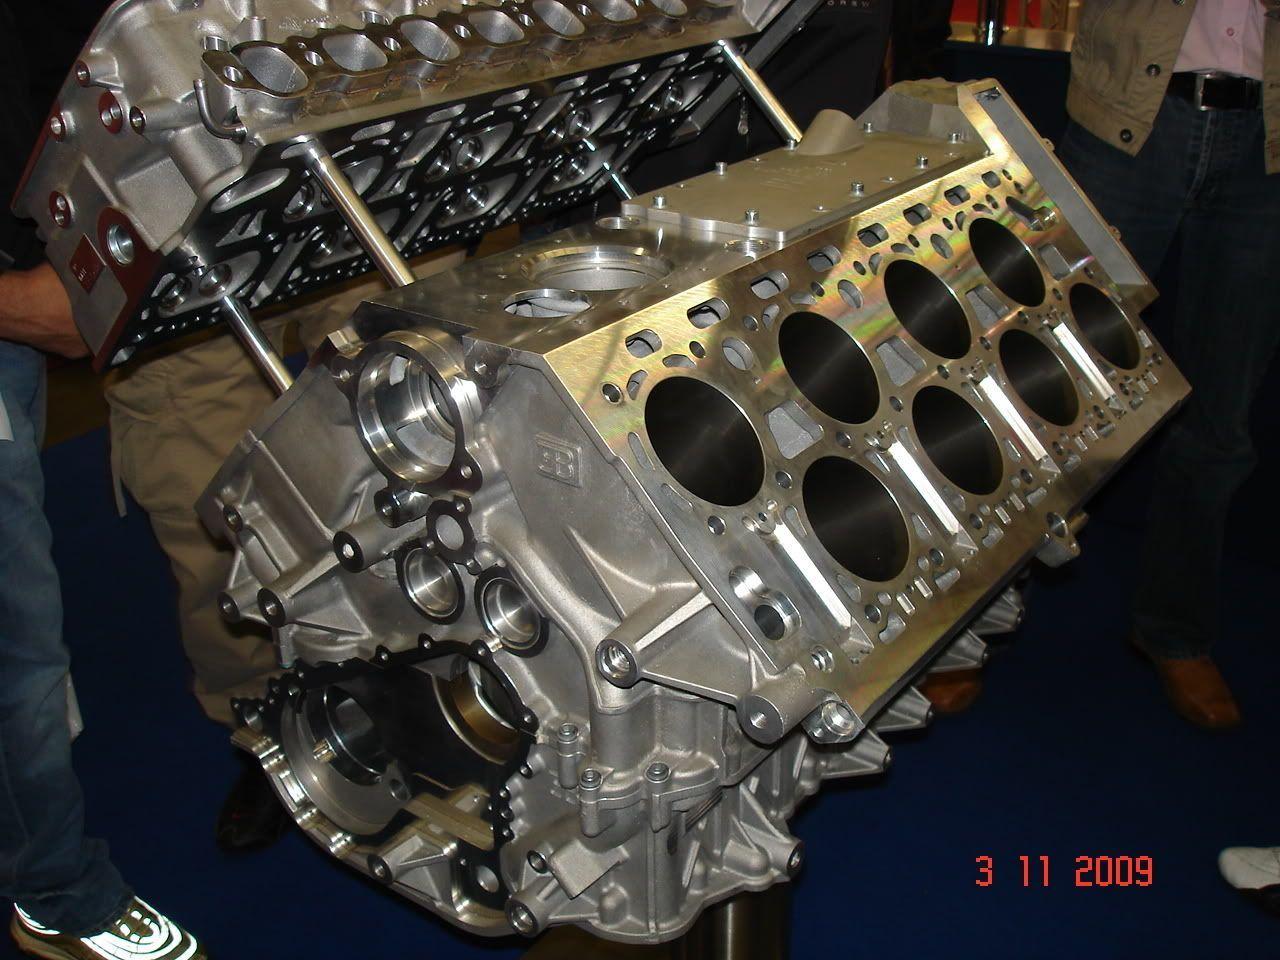 Bugatti Veyeron W16 engine block. #bugattiveyronengine